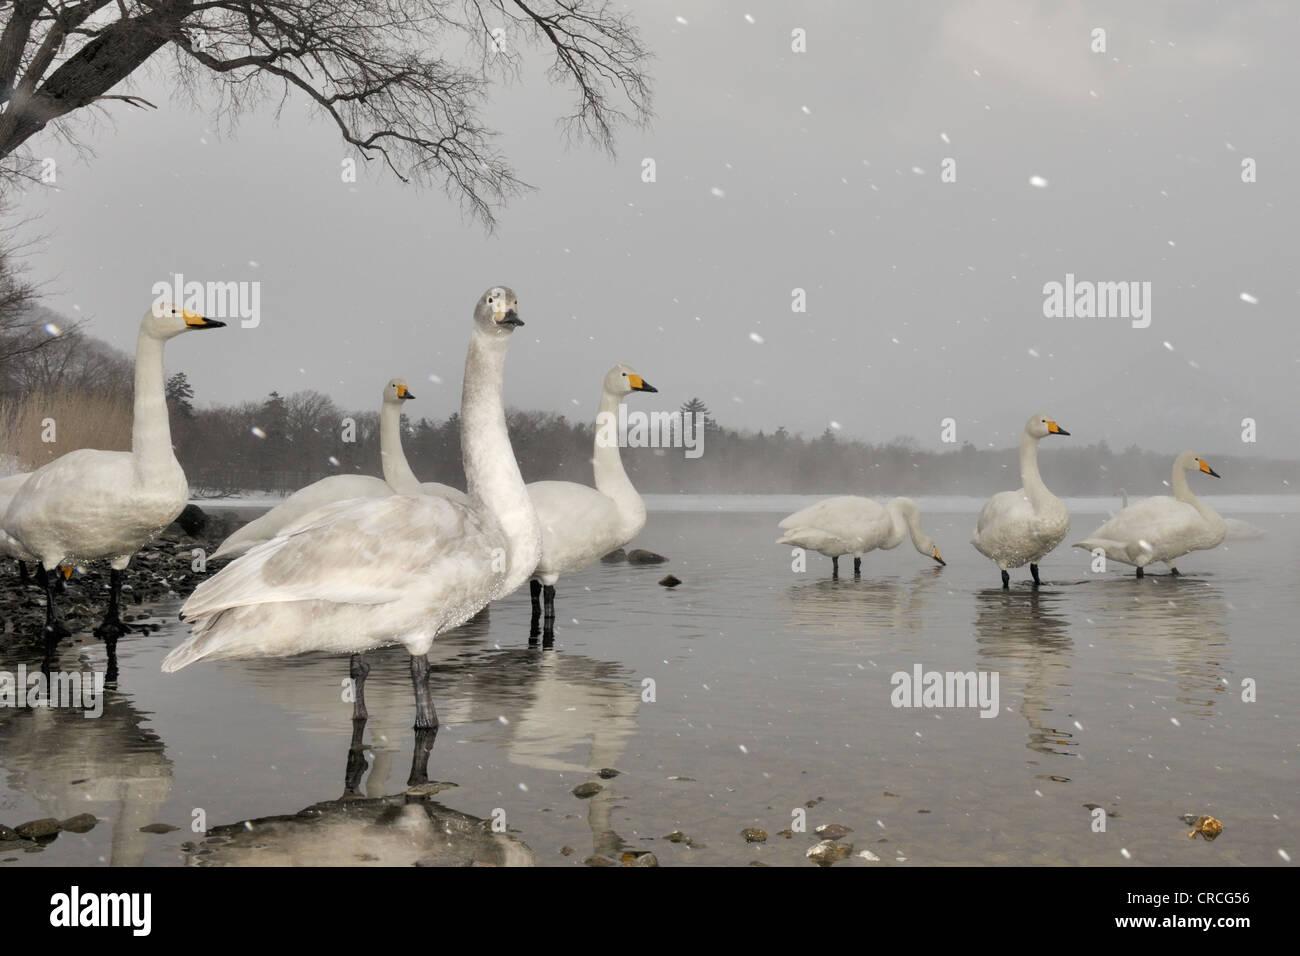 Whooper Swans (Cygnus cygnus) standing in lake while snowing, Kussharo lake, Akan national park, Hokkaido, Japan. - Stock Image